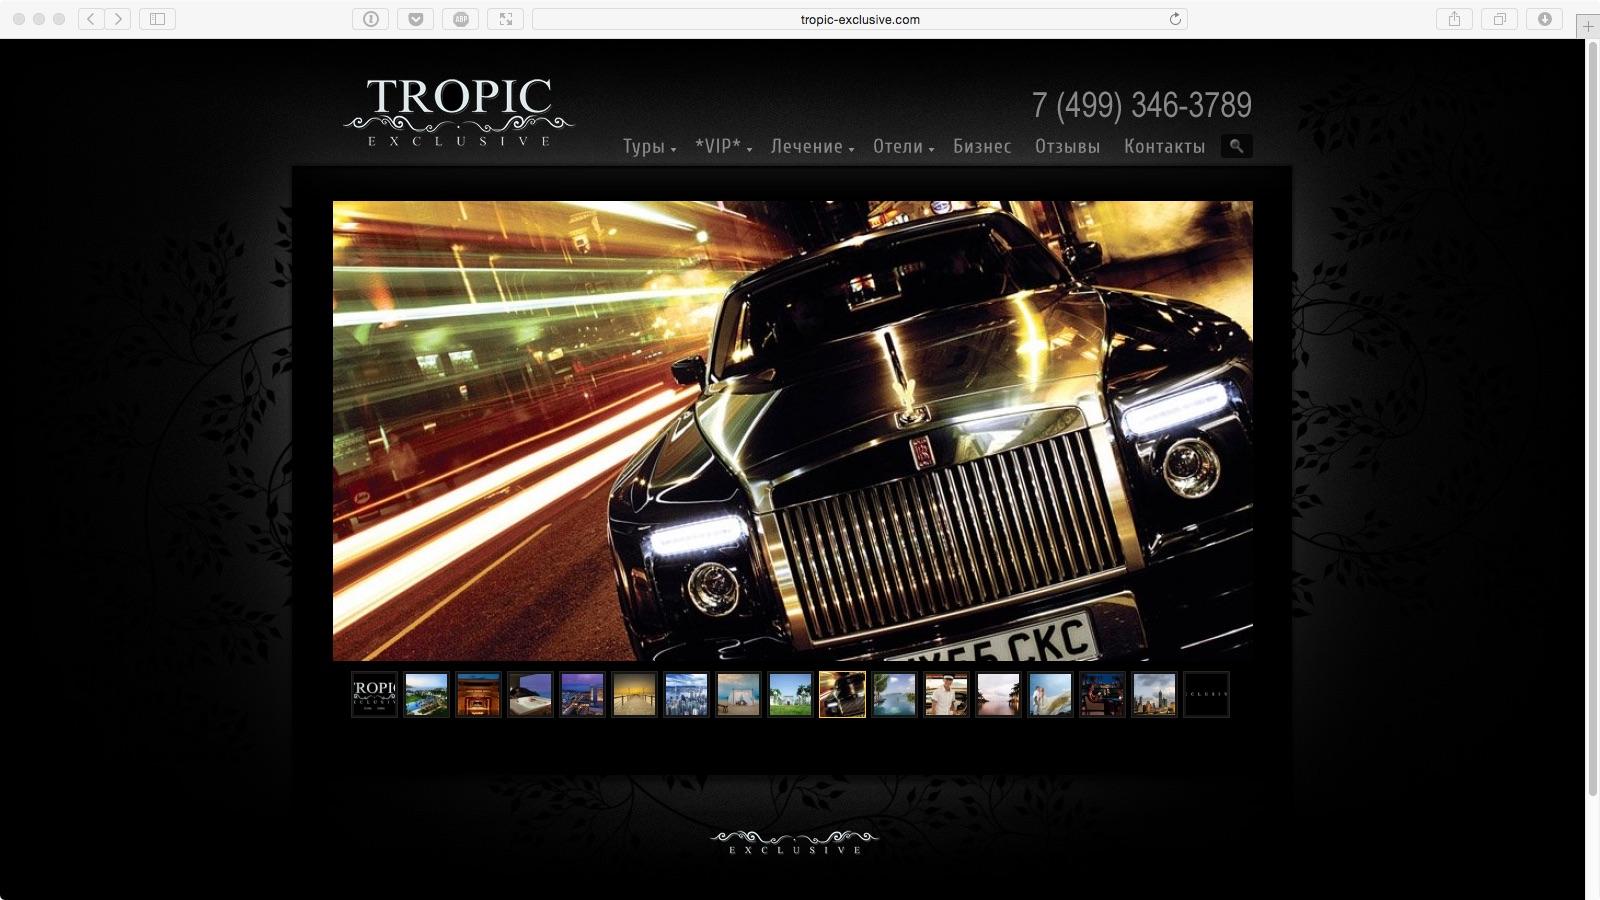 旅游VIP服务:TROPIC-EXCLUSIVE.COM